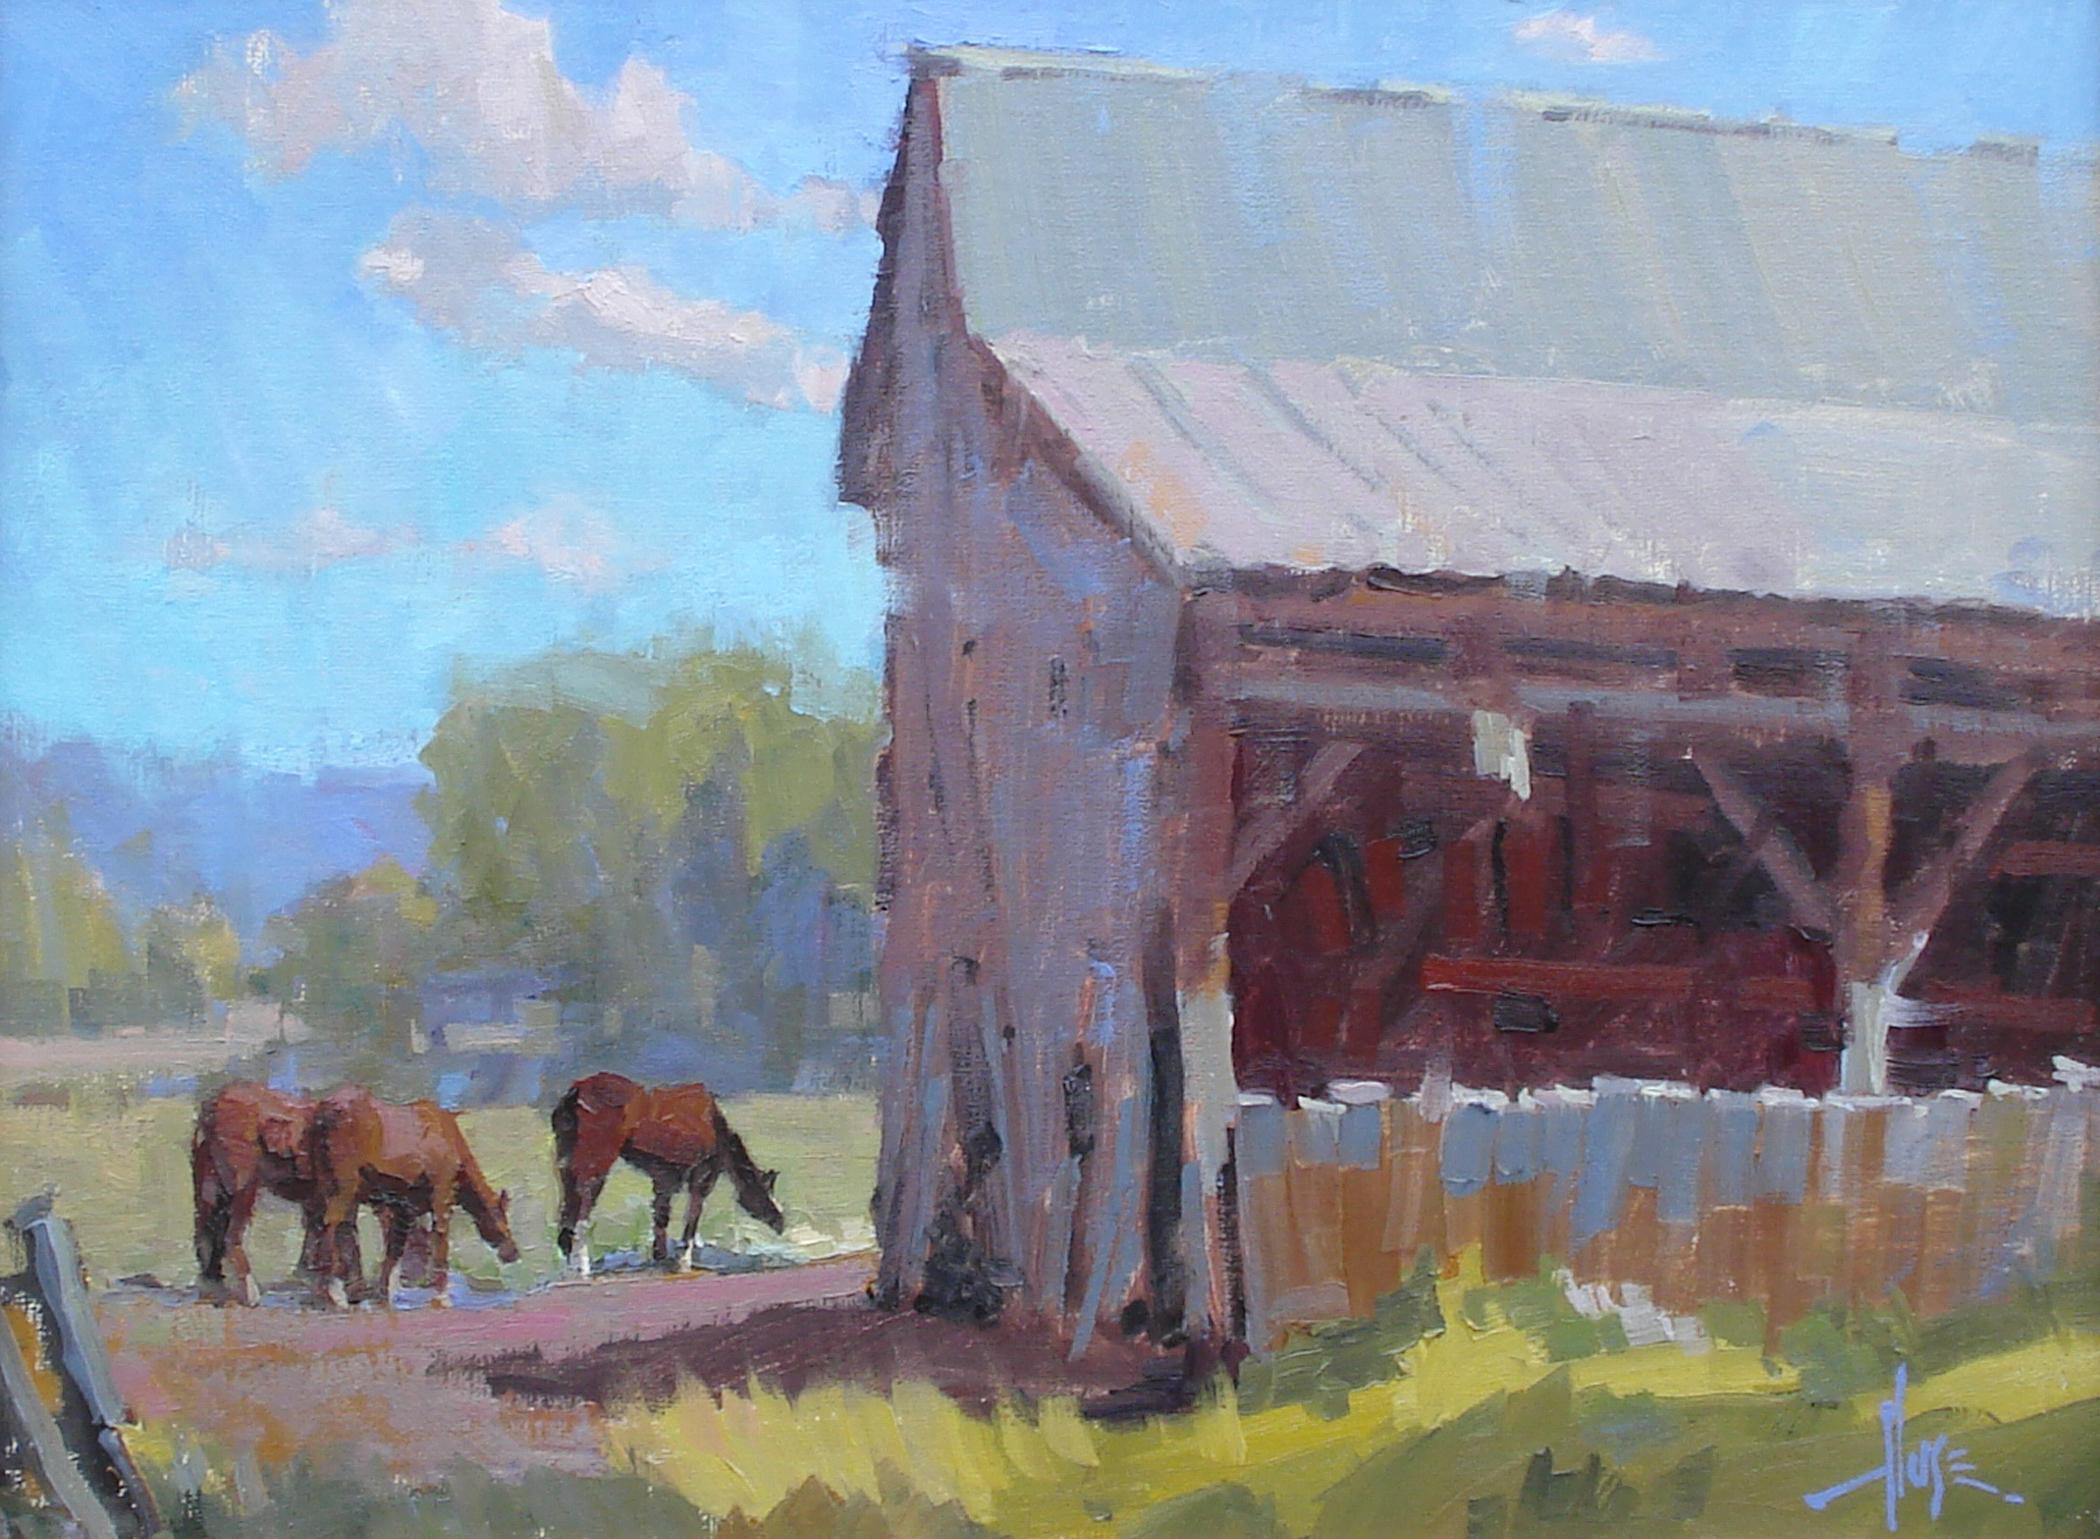 Pasture Pals 12x16 © Debra Huse 2015Plein Air Maynard Dixon Camp Out  copy.jpg